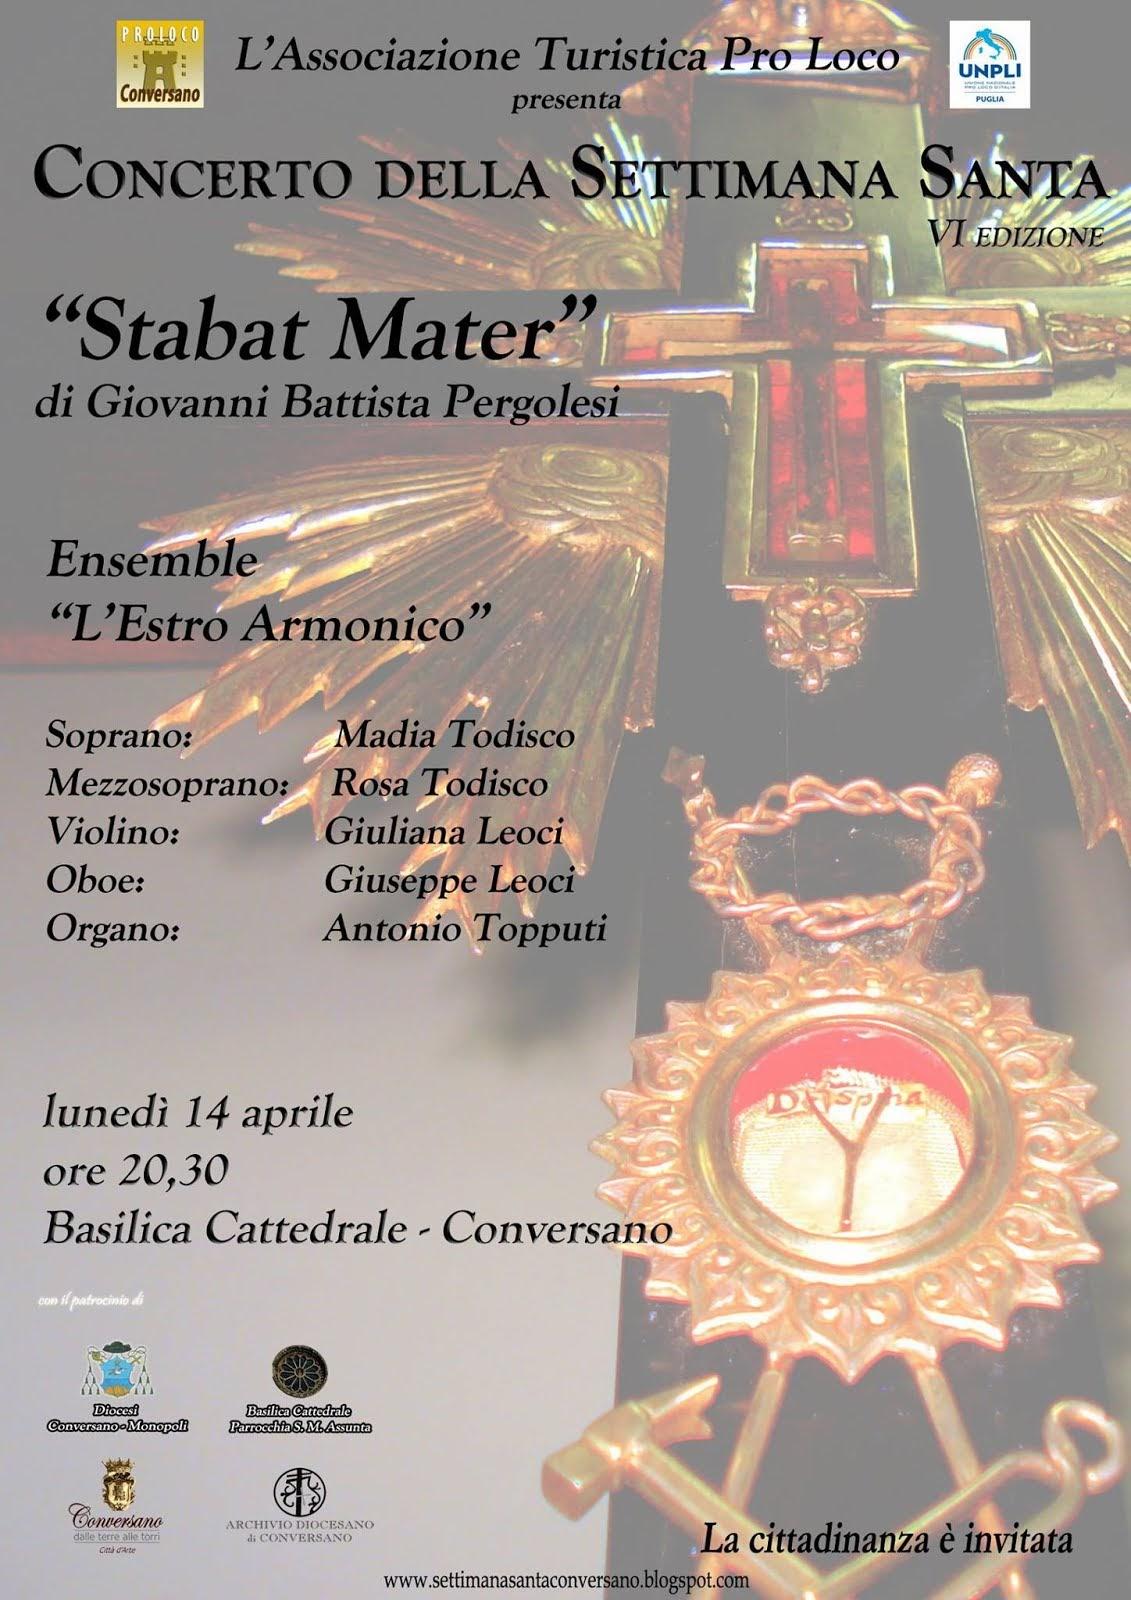 lunedì 14 aprile 2014 ore 20,00 Basilica Cattedrale